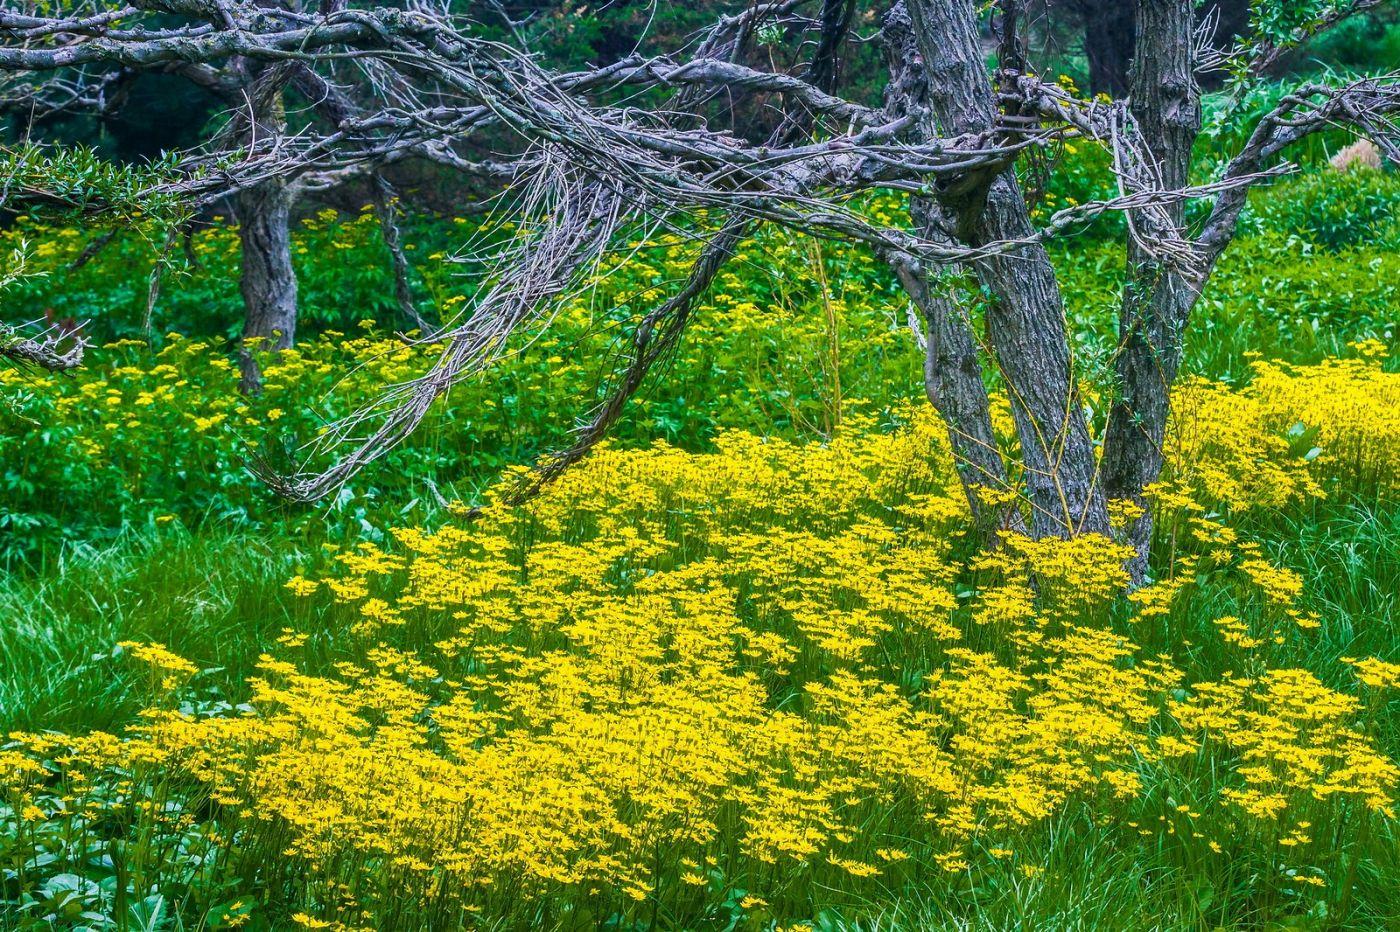 Chanticleer花园,有梦想的季节_图1-3